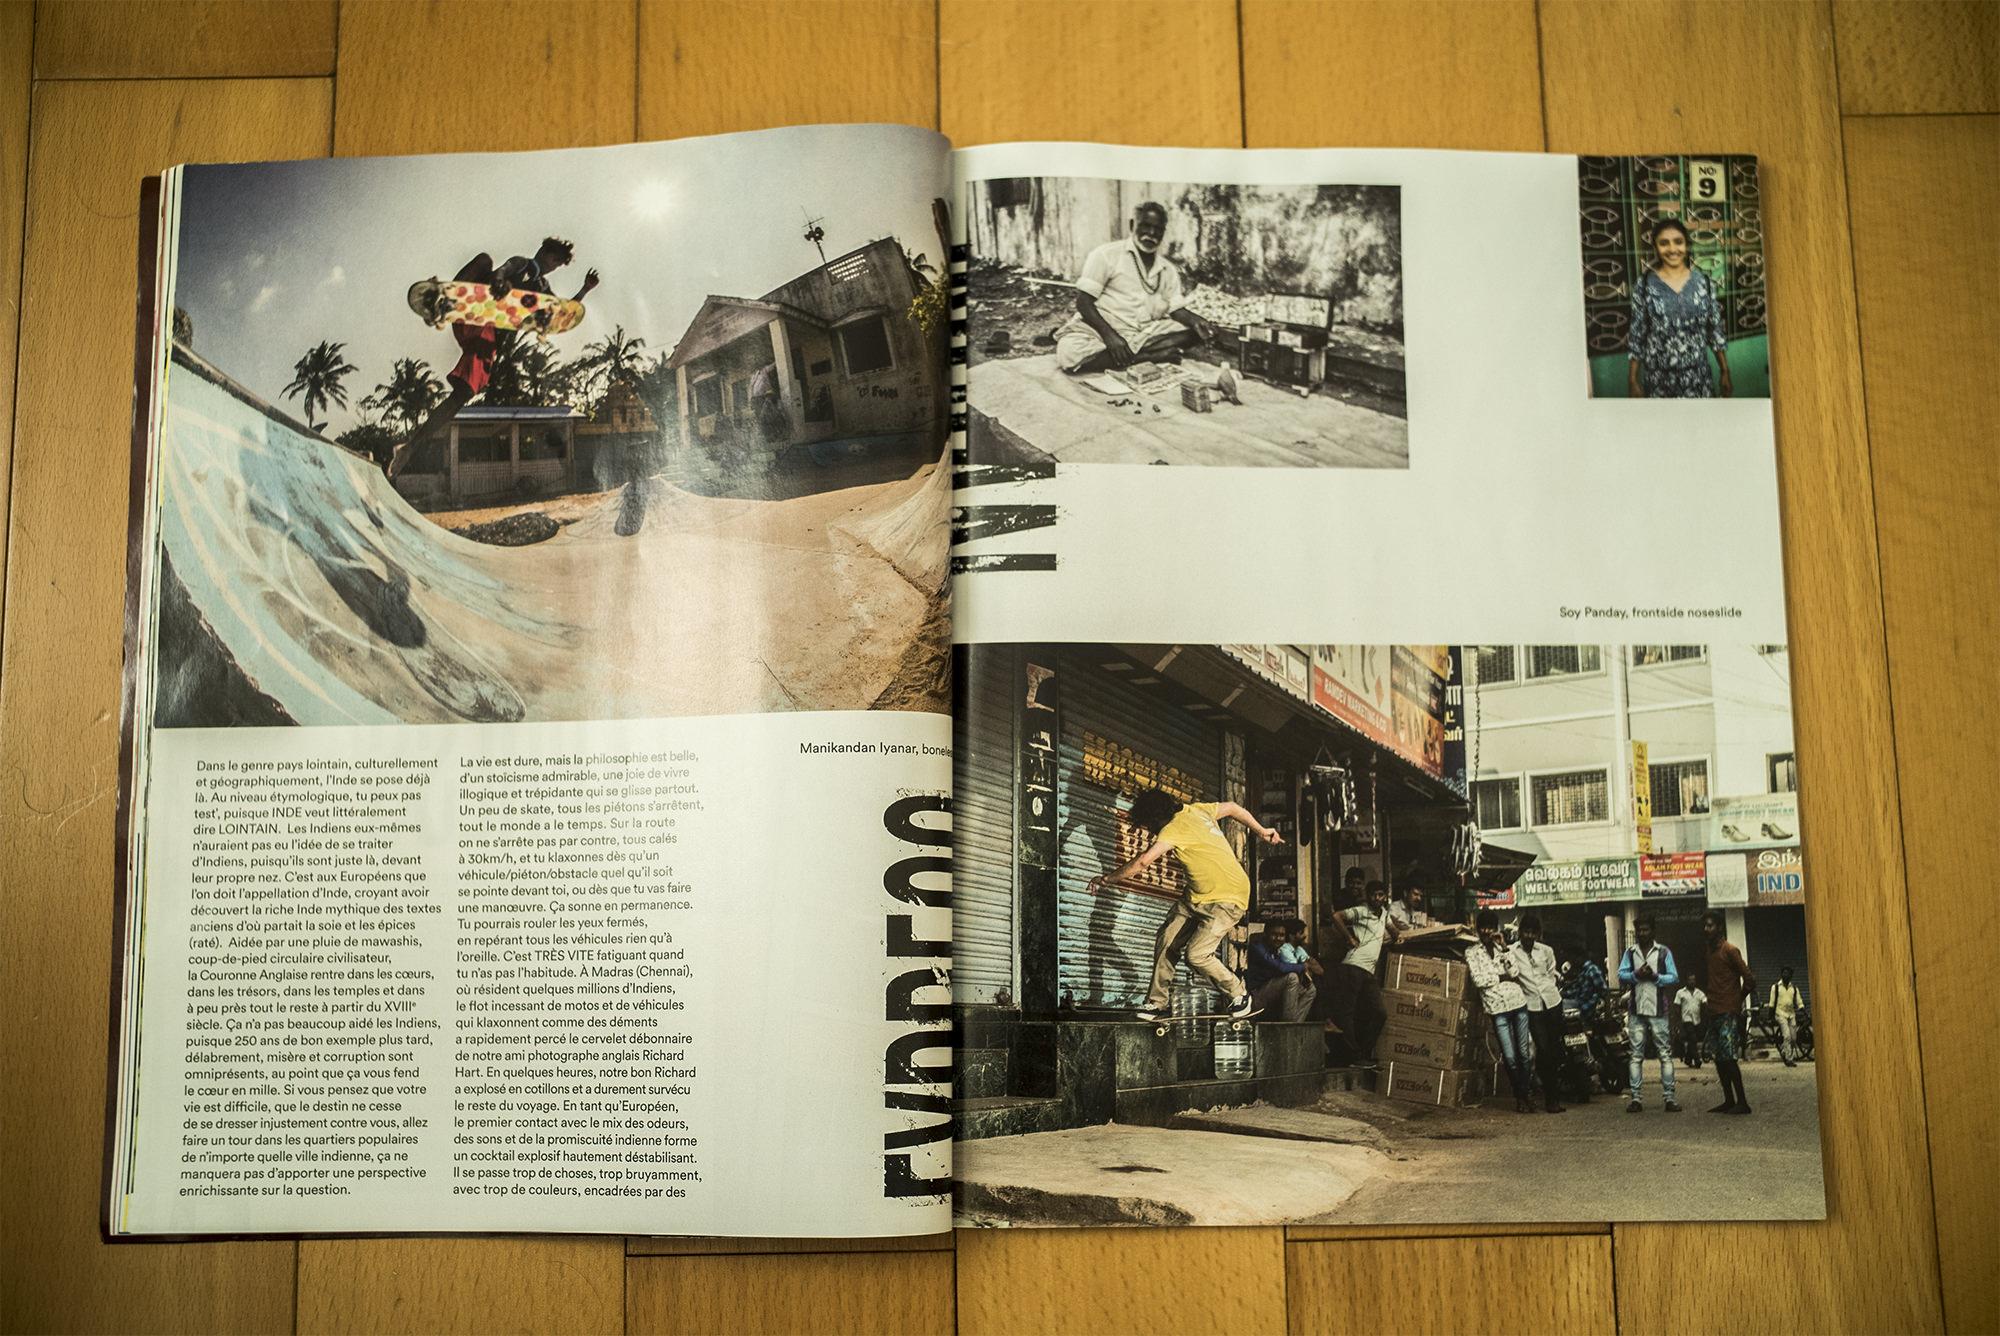 Sugar Magazine Issue 196 Page 01 LOWQ 2000P-1